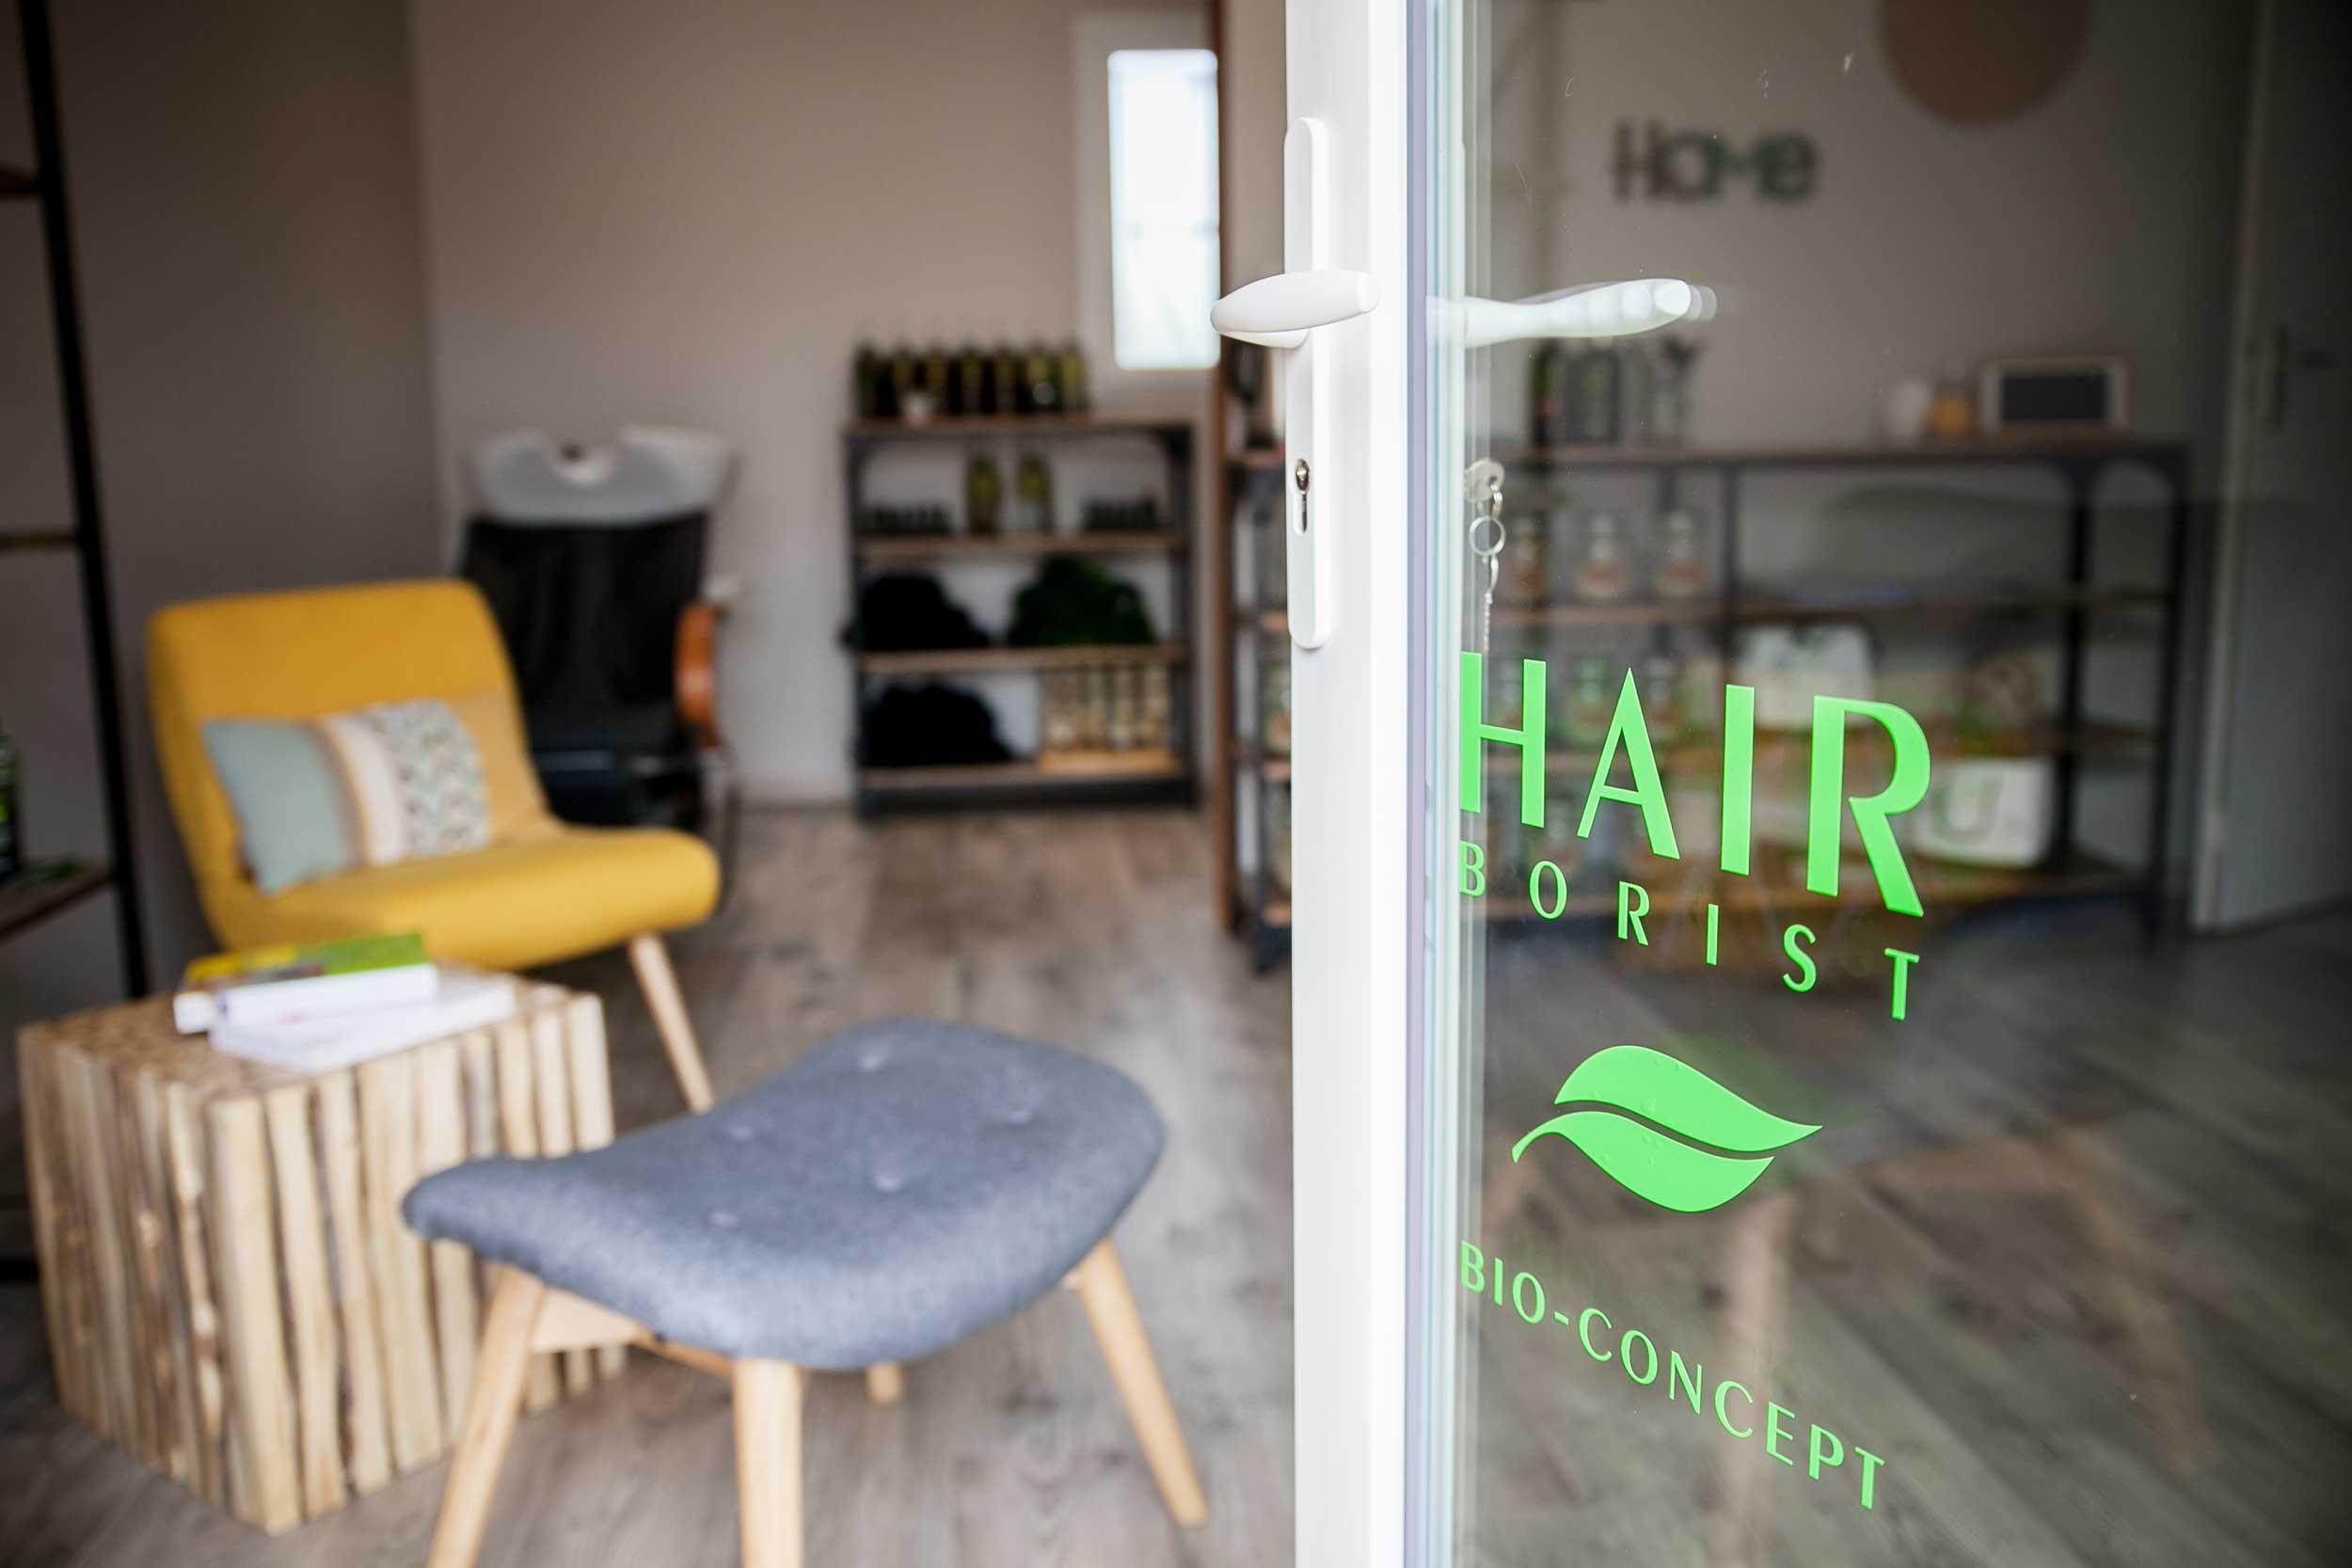 entree hairspa bio logo hairborist